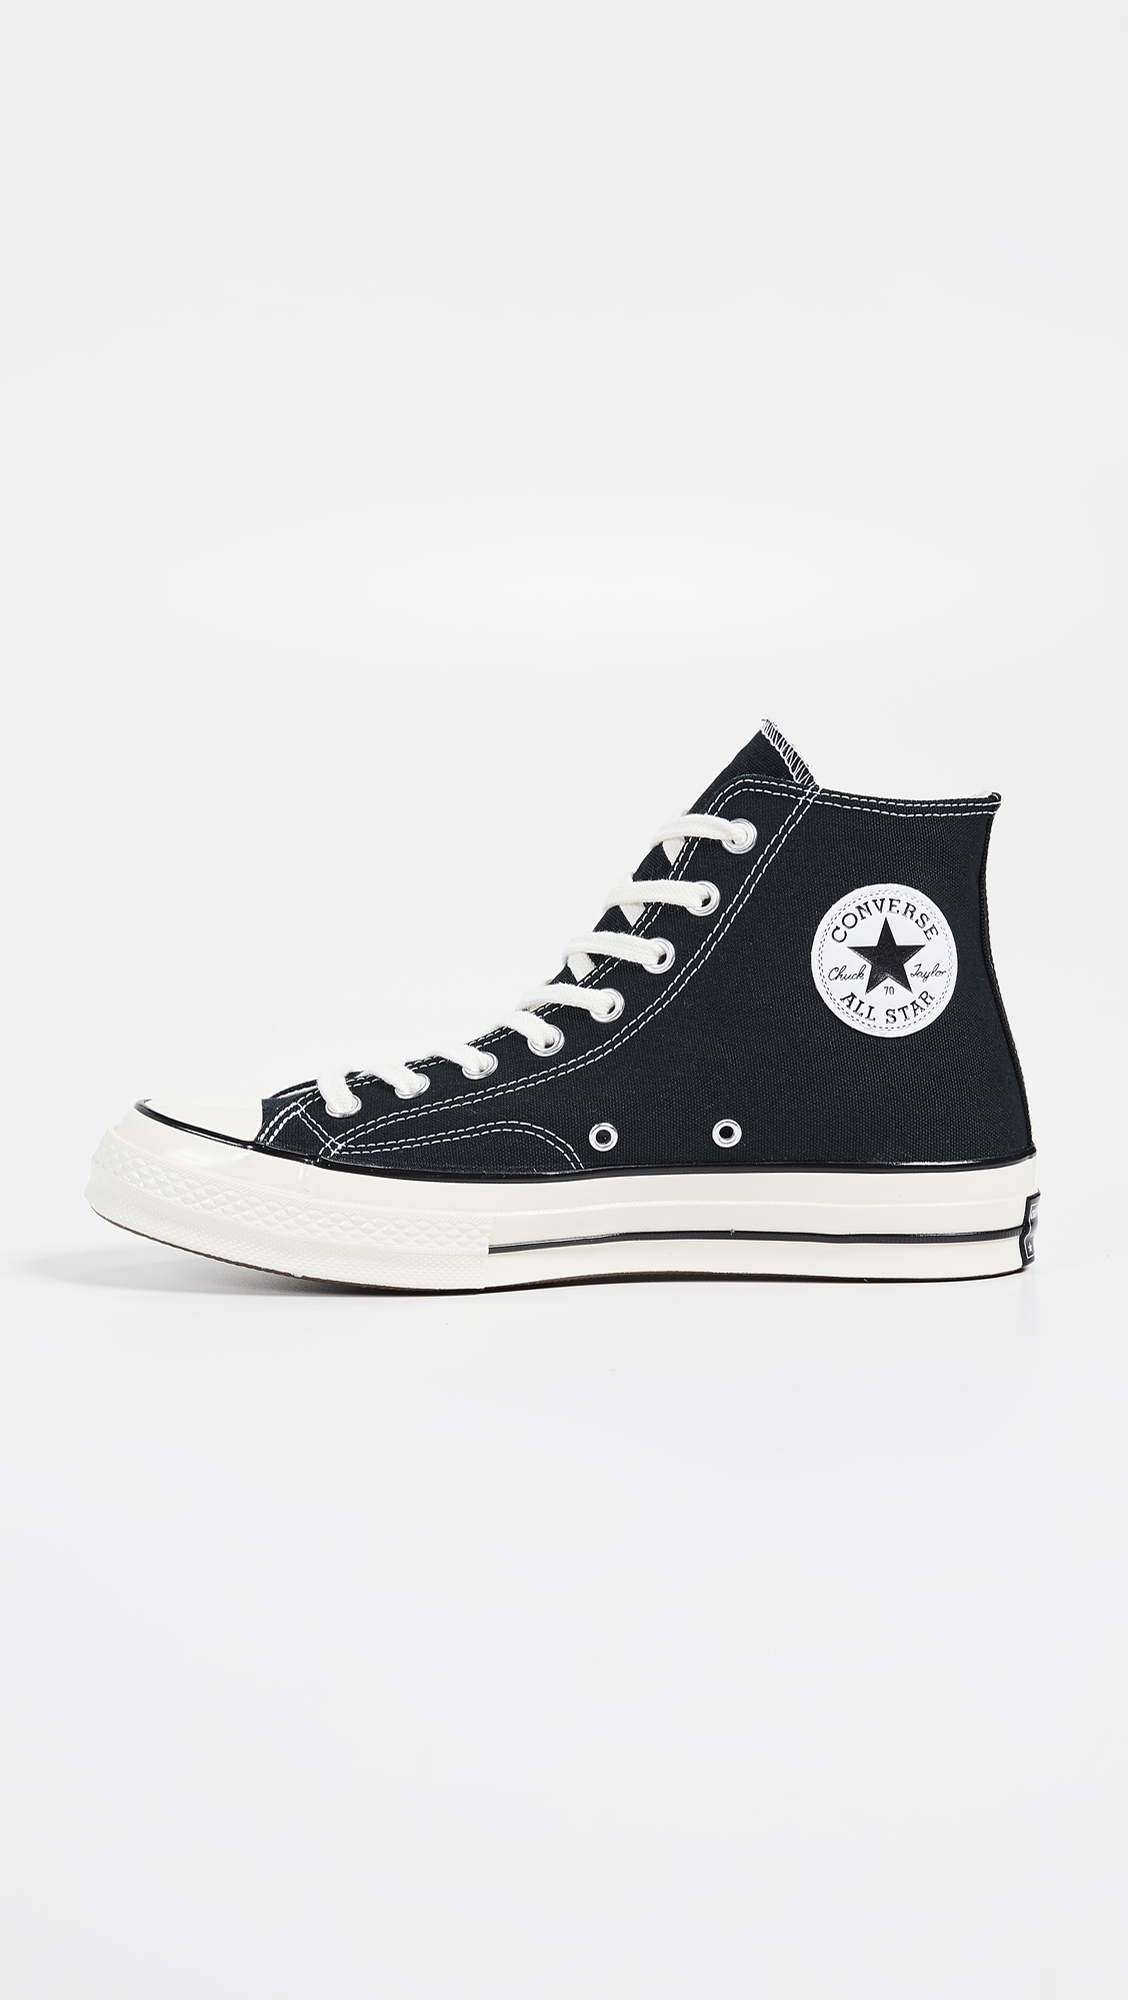 2b852d84e60e70 Converse Chuck Taylor All Star  70s High Top Sneakers